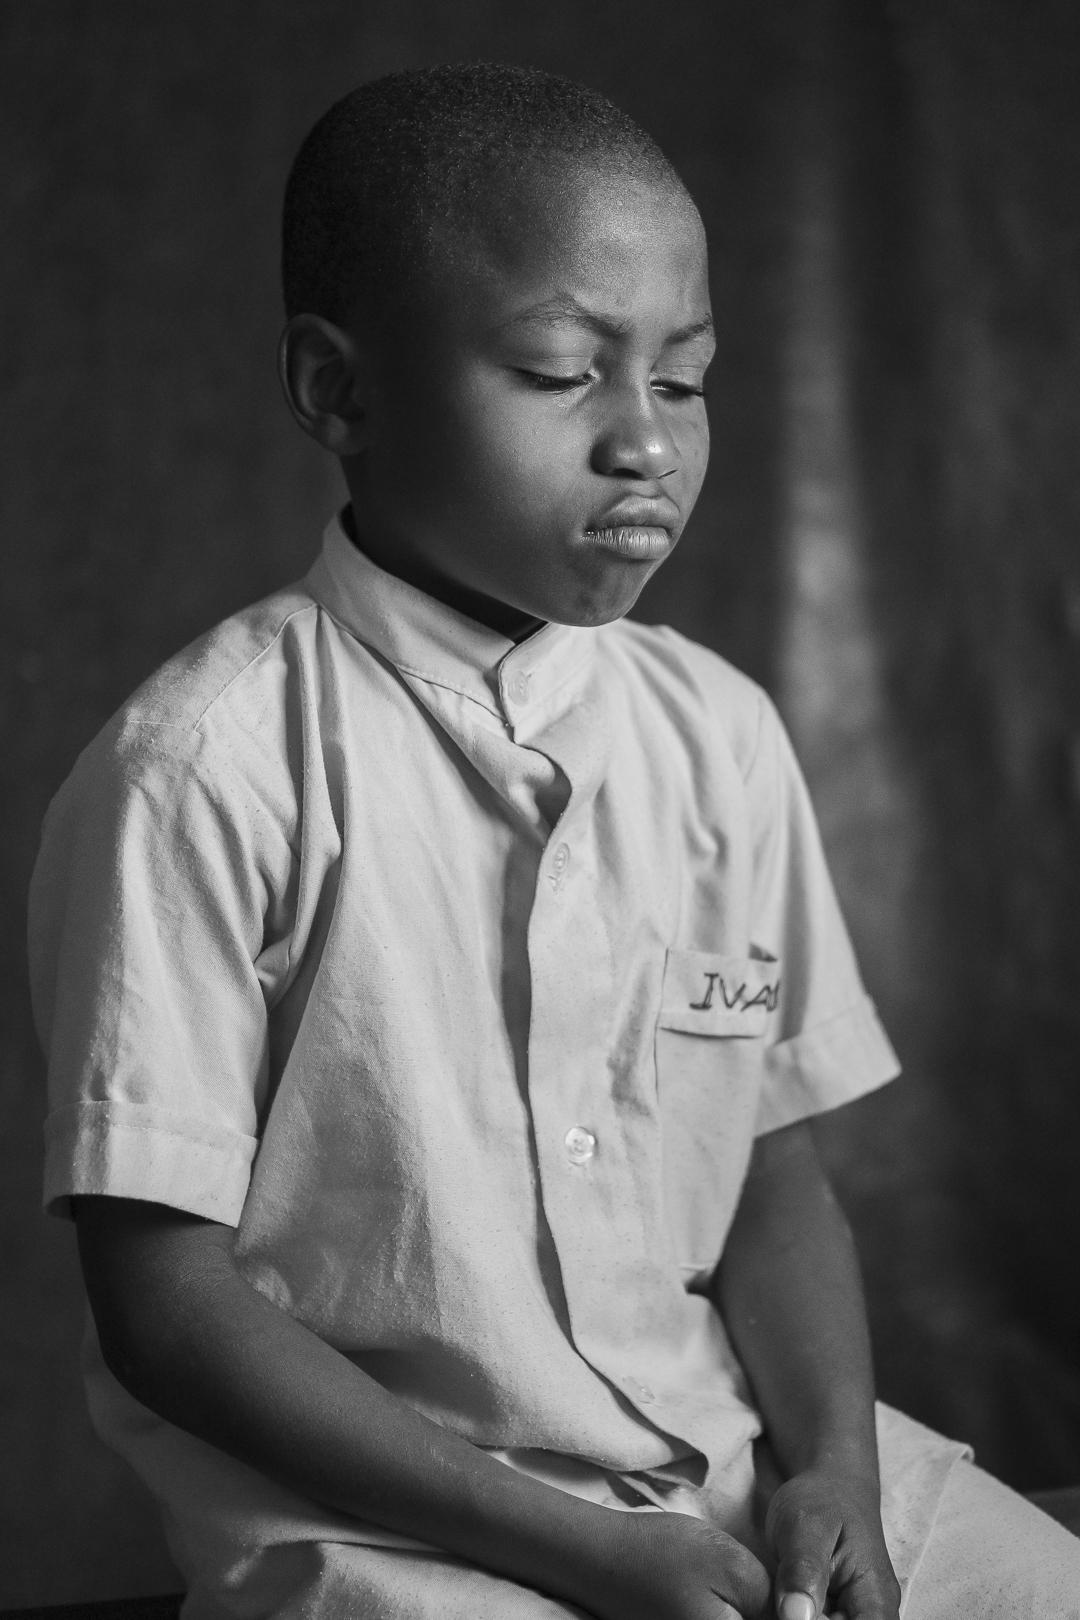 Ivan | 9 years old